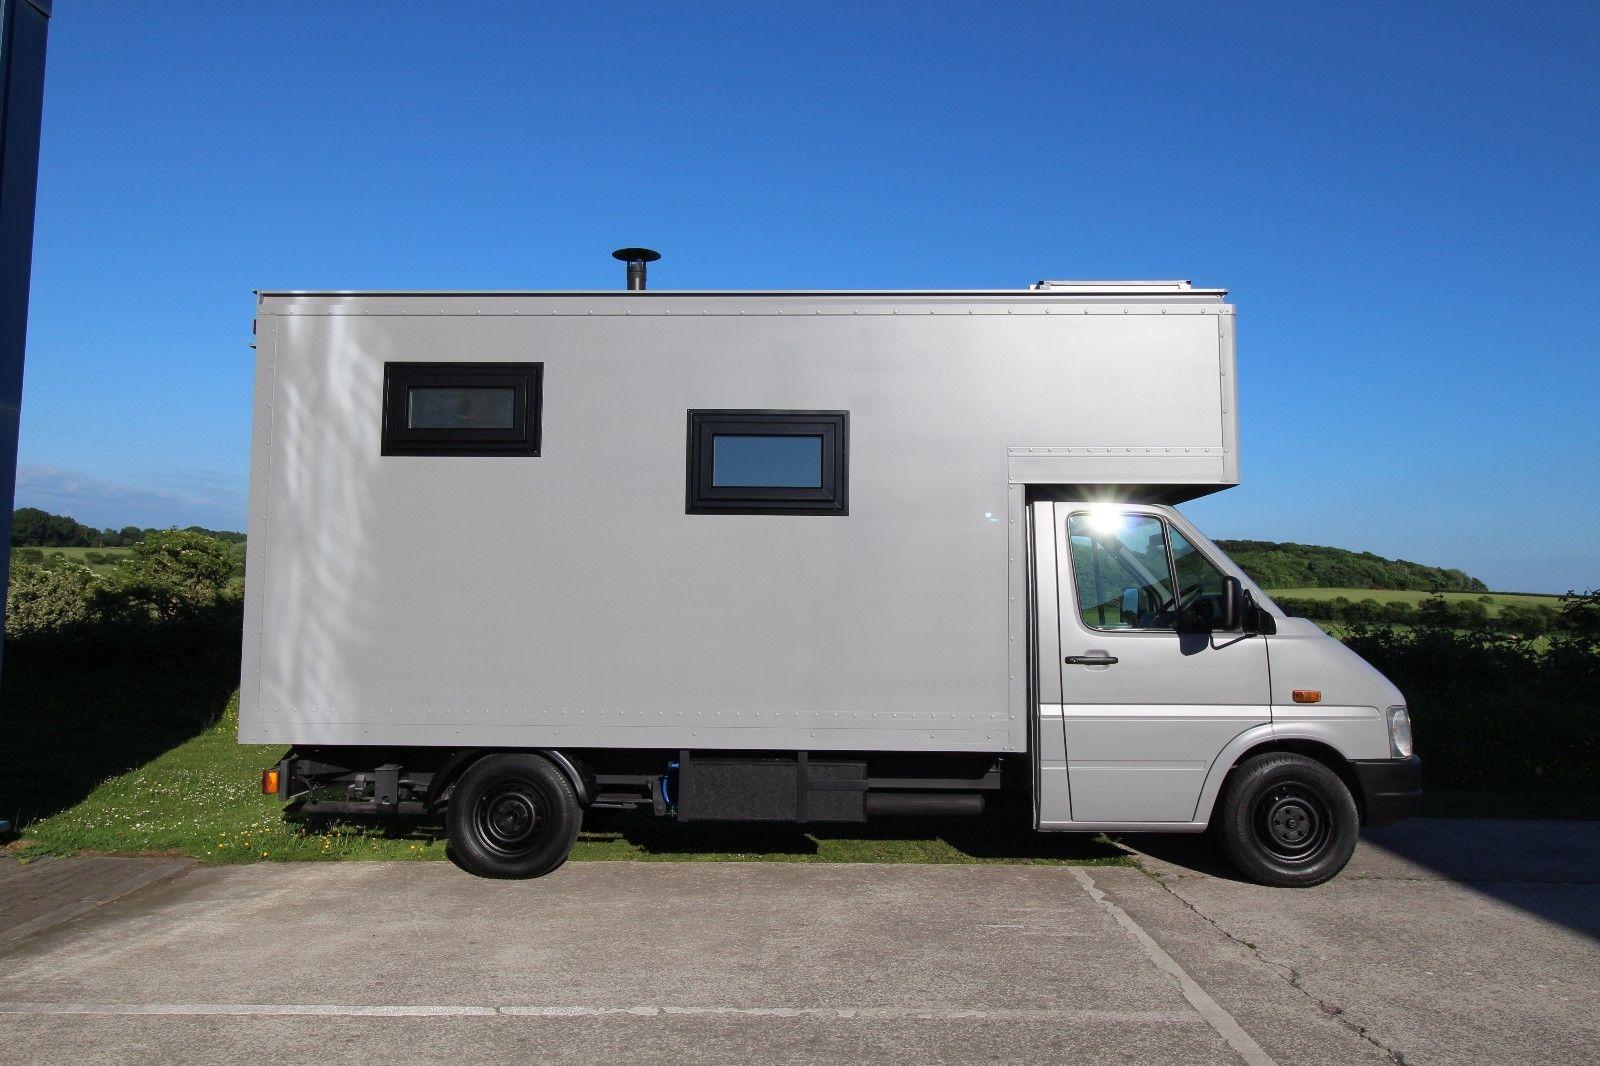 Unique Box Van Conversion Diy Inspiration Builds